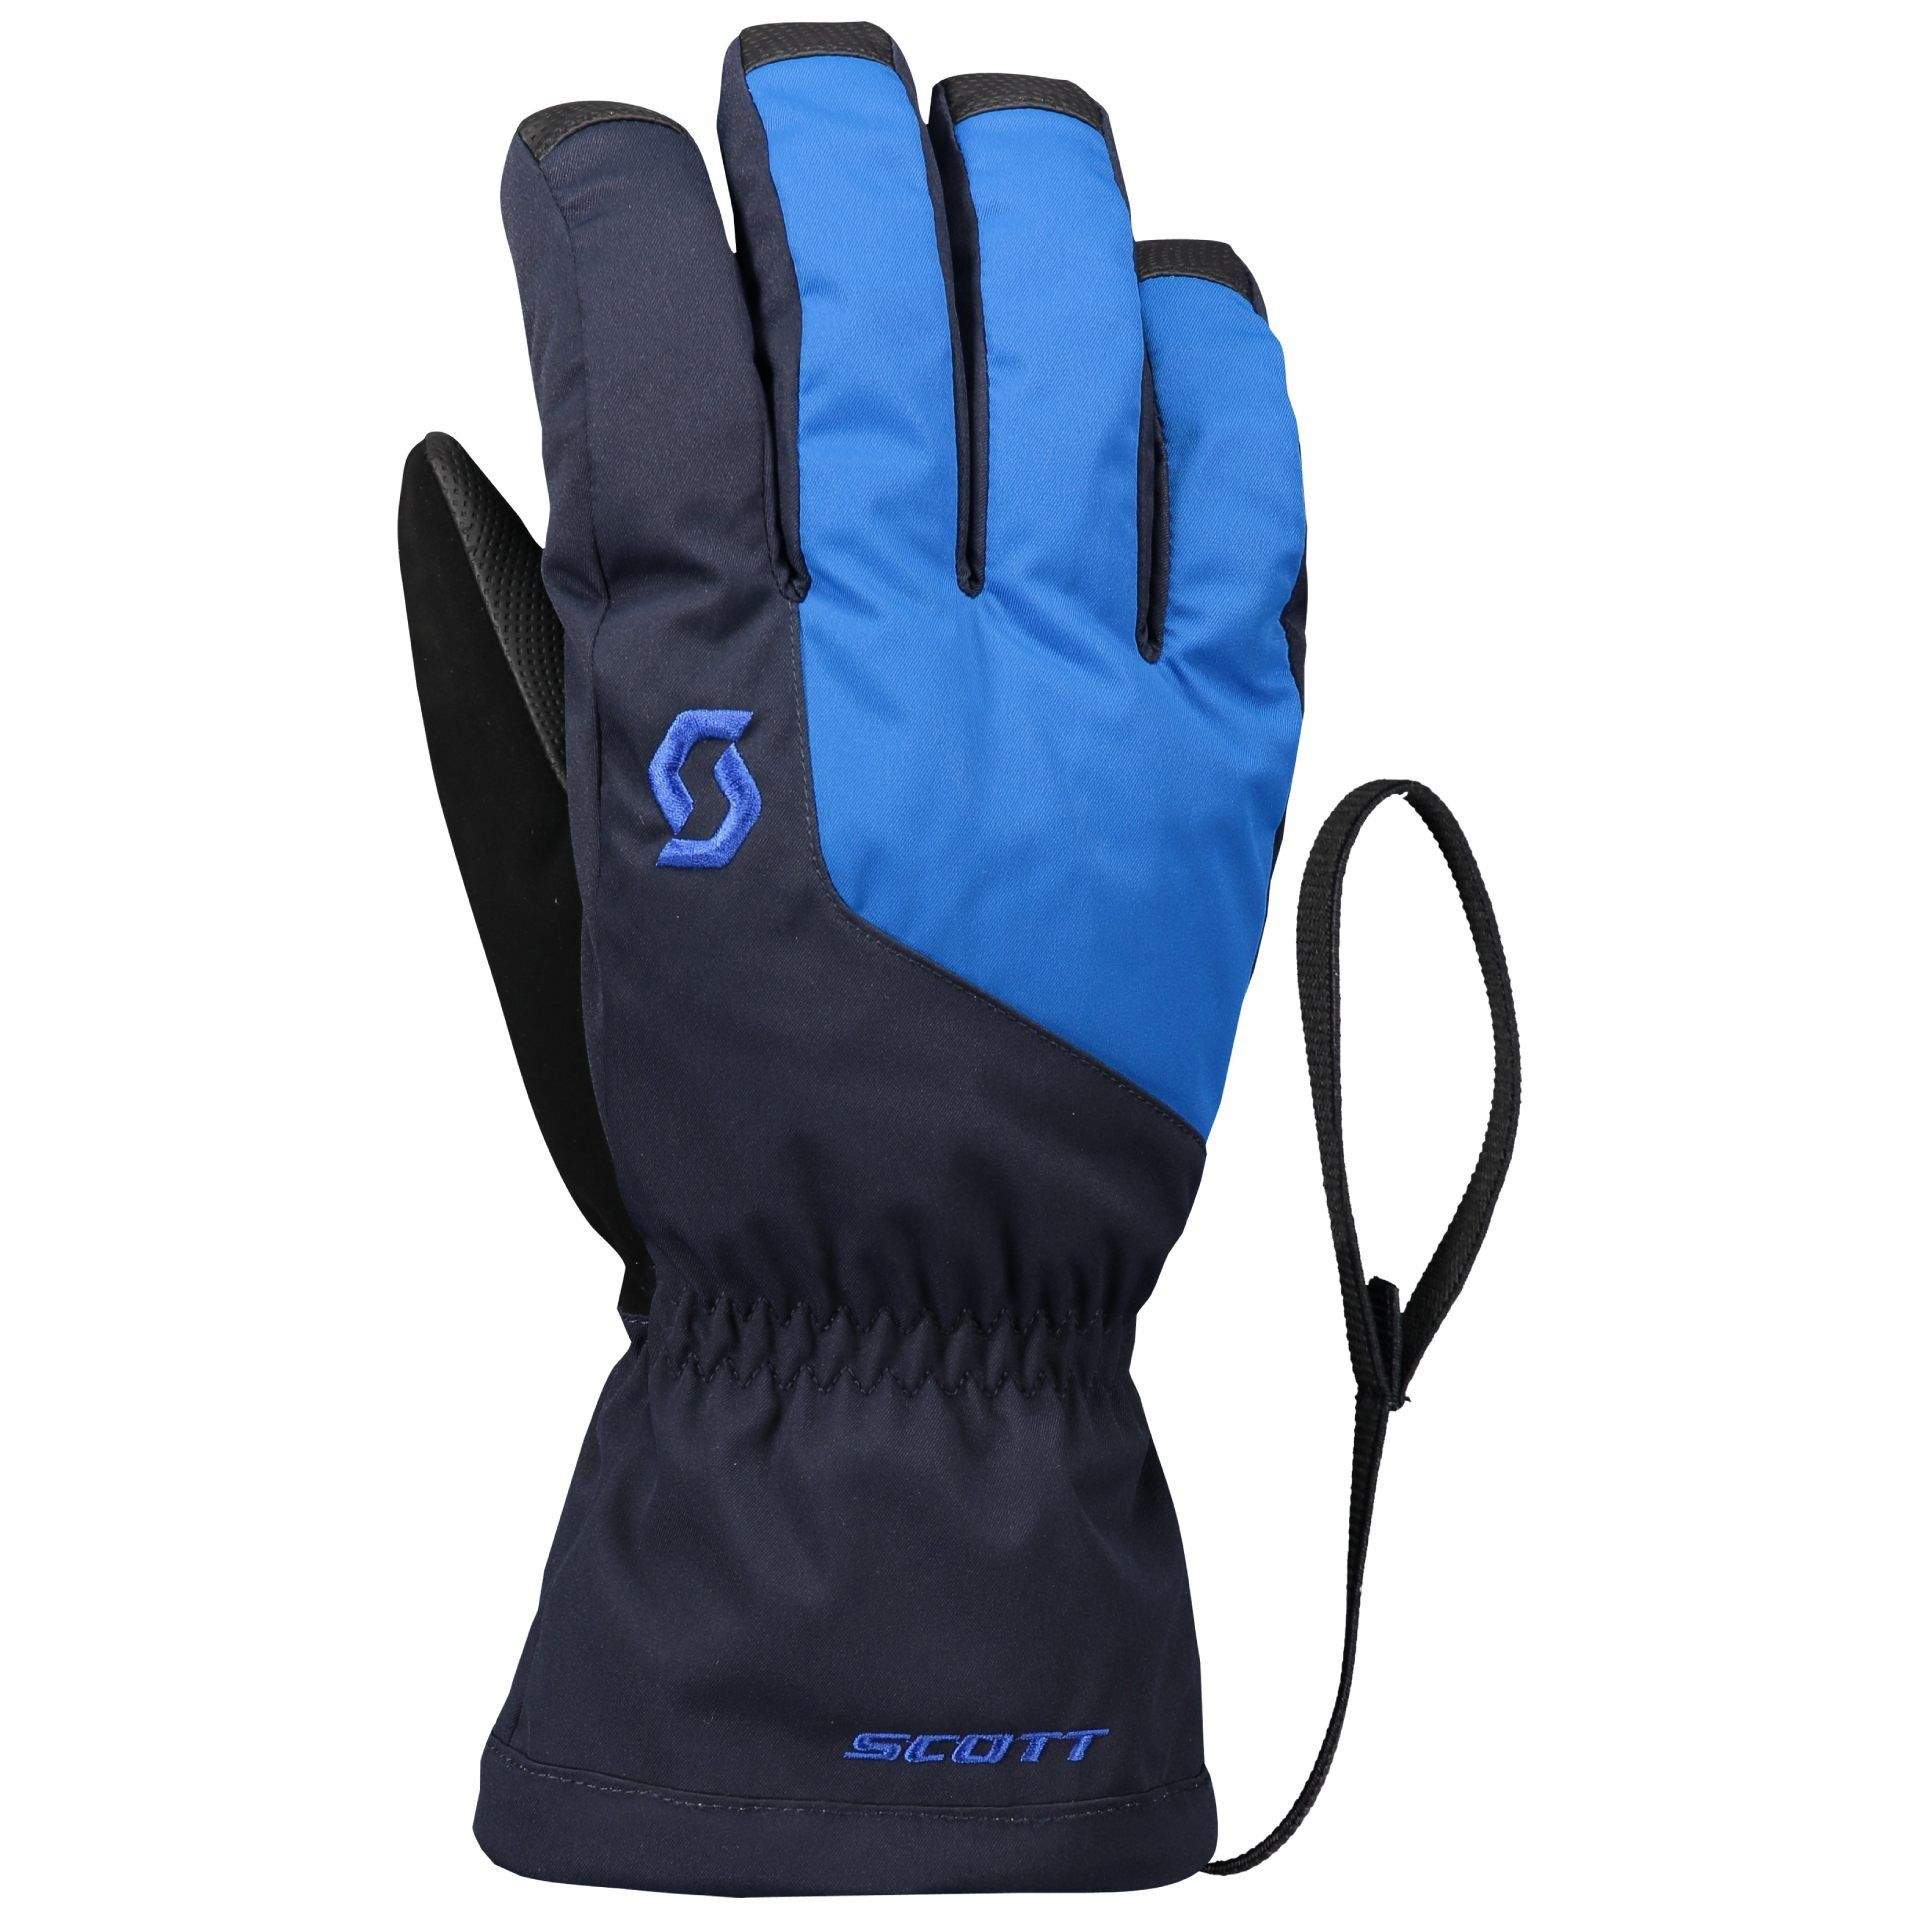 RĘKAWICE SCOTT ULTIMATE GTX GLOVE 277941 DARK BLUE|SKYDIVE BLUE